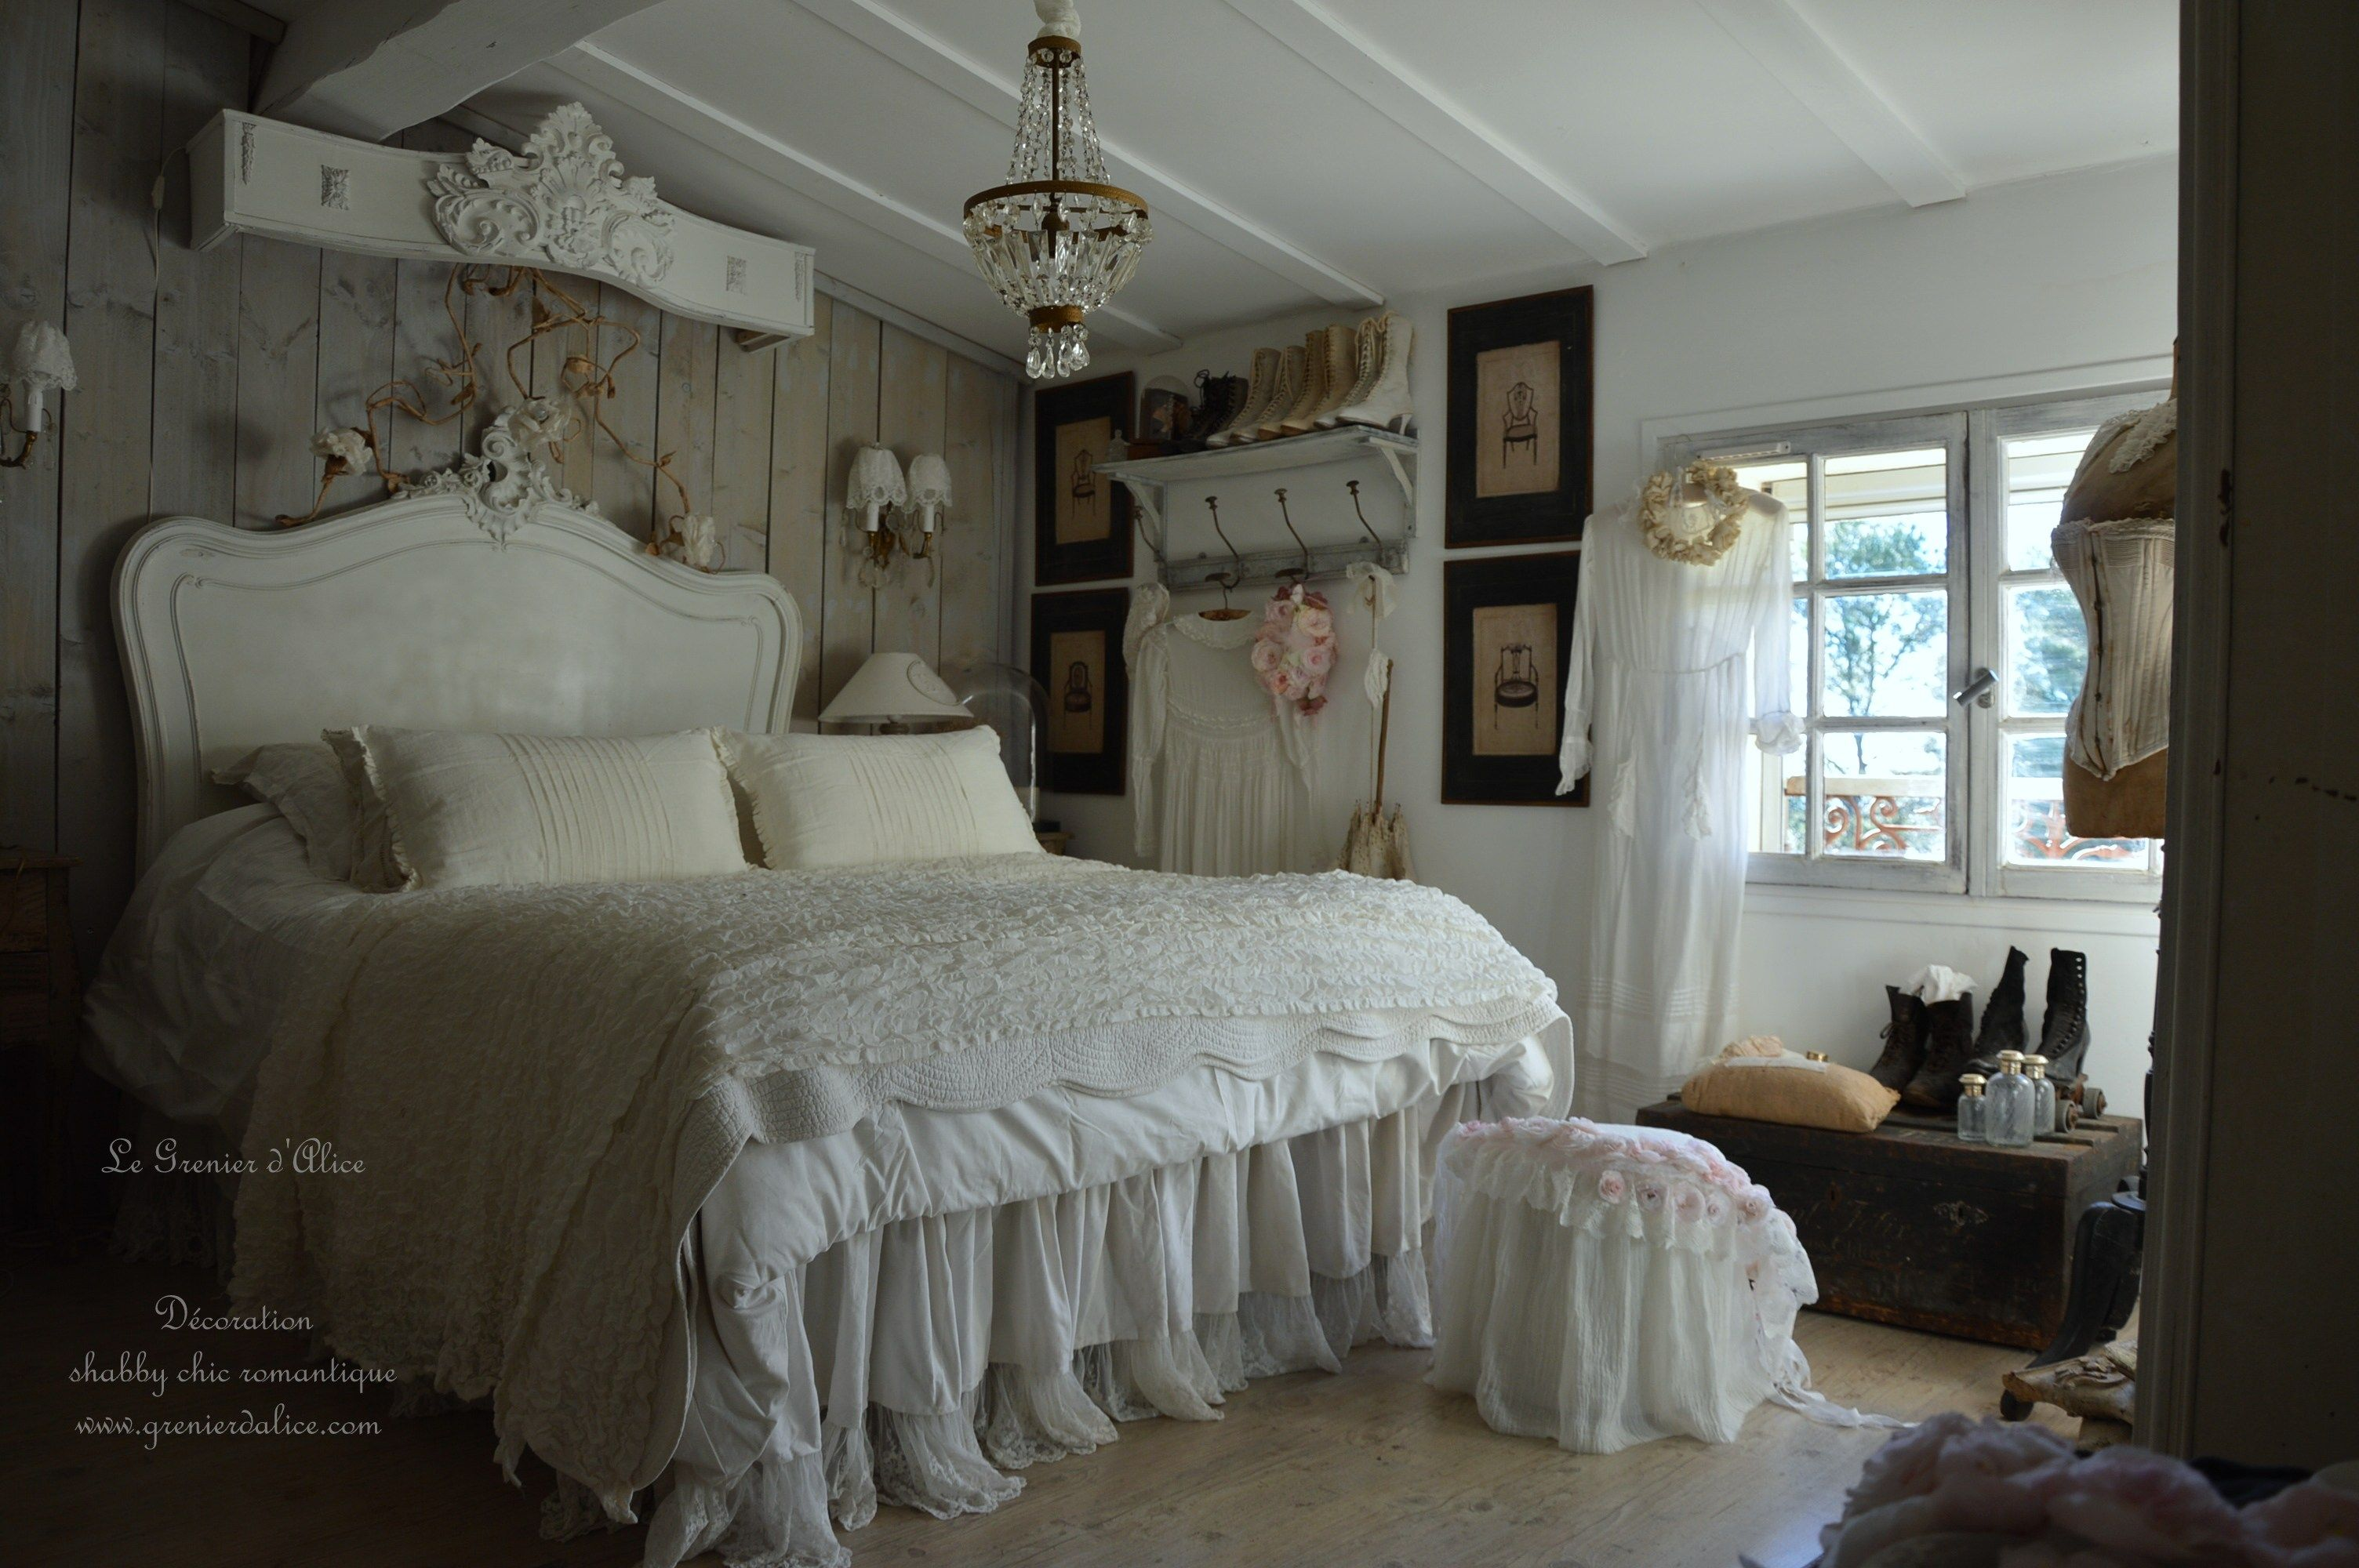 chambre à coucher style anglais | chambre coucher style ...